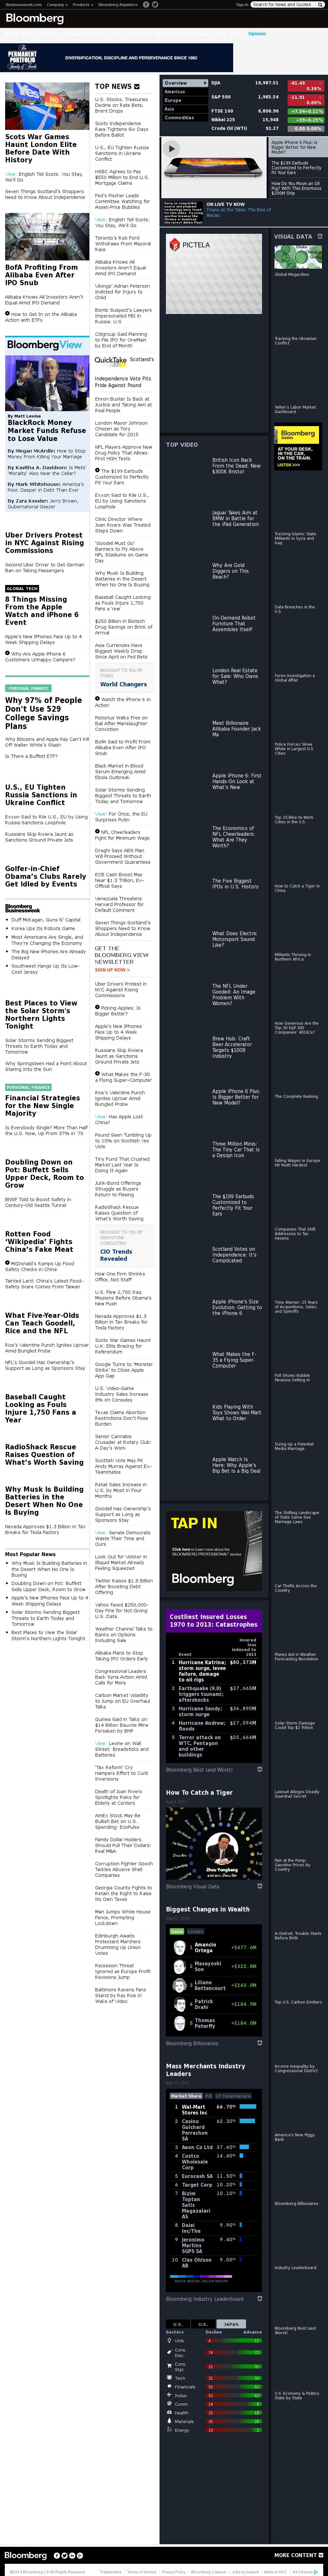 Bloomberg at Saturday Sept. 13, 2014, 5 a.m. UTC